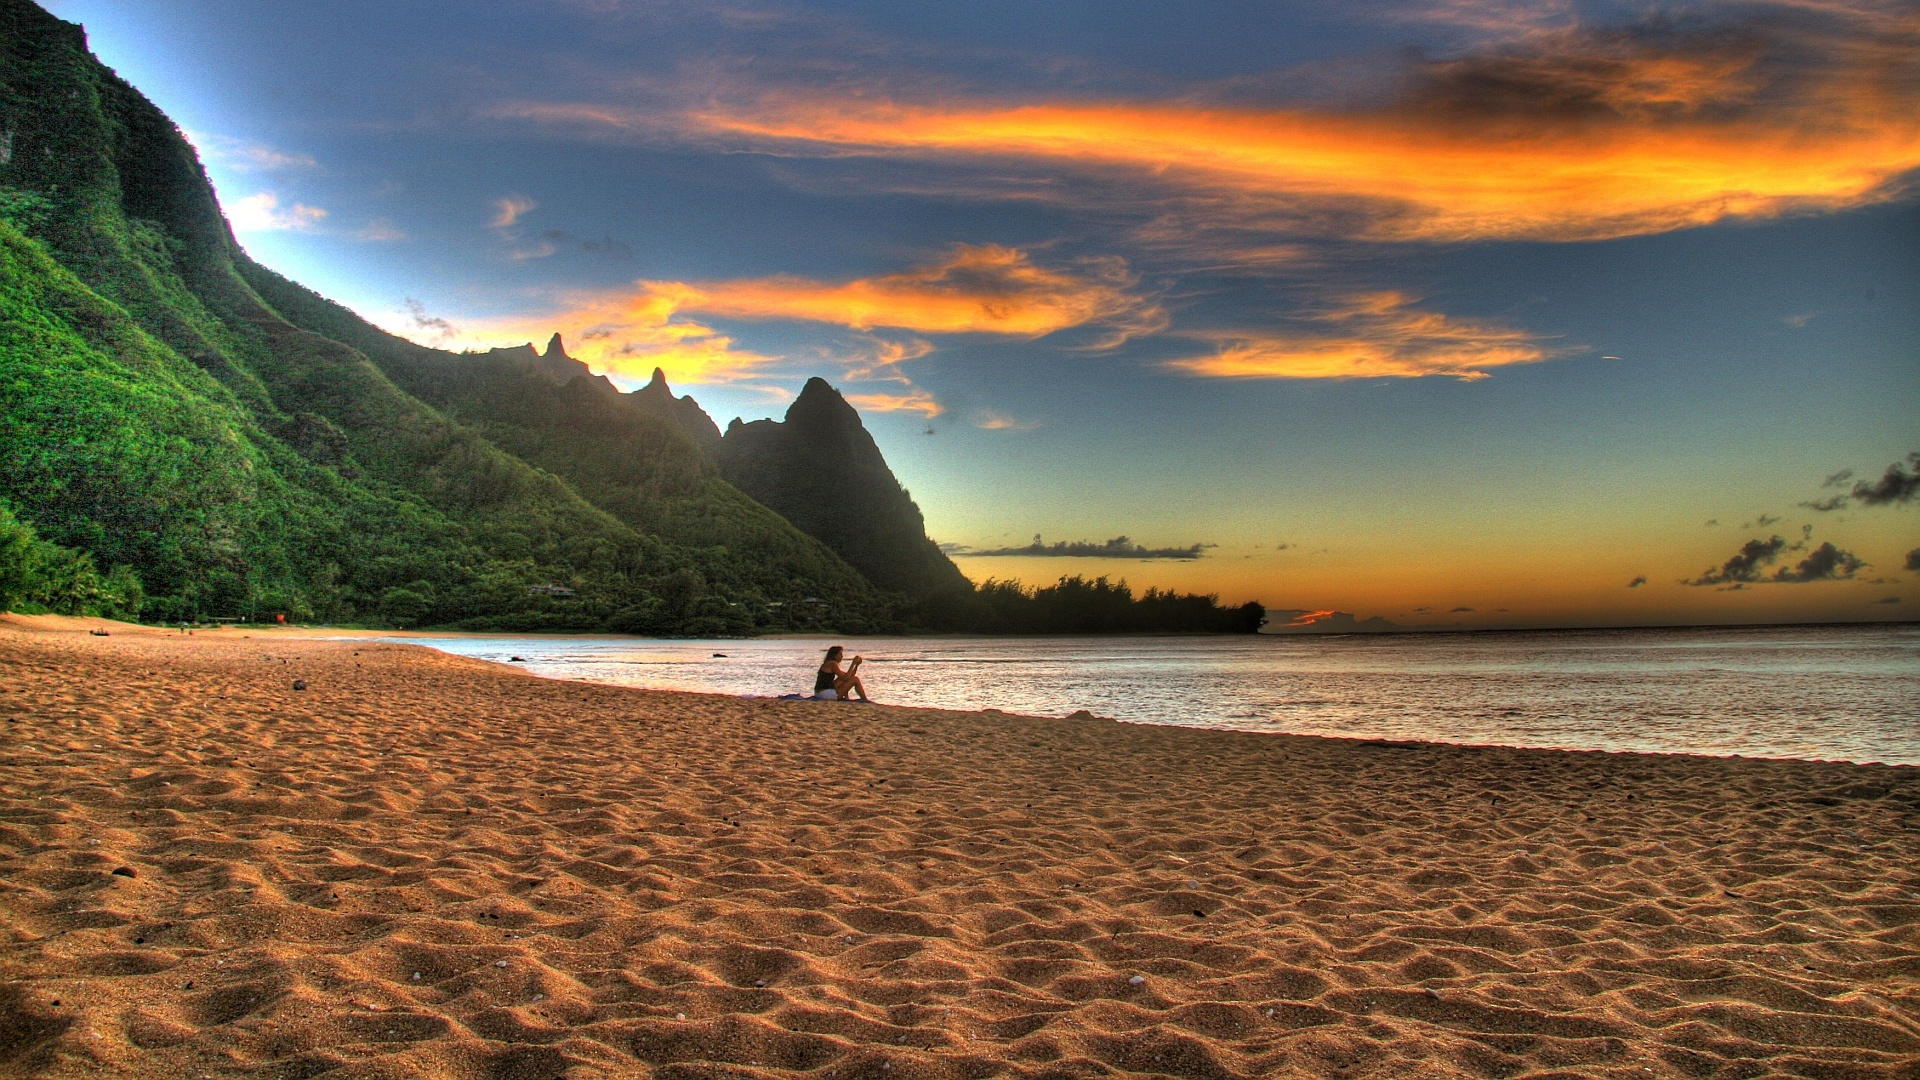 Sunset Sand Beach